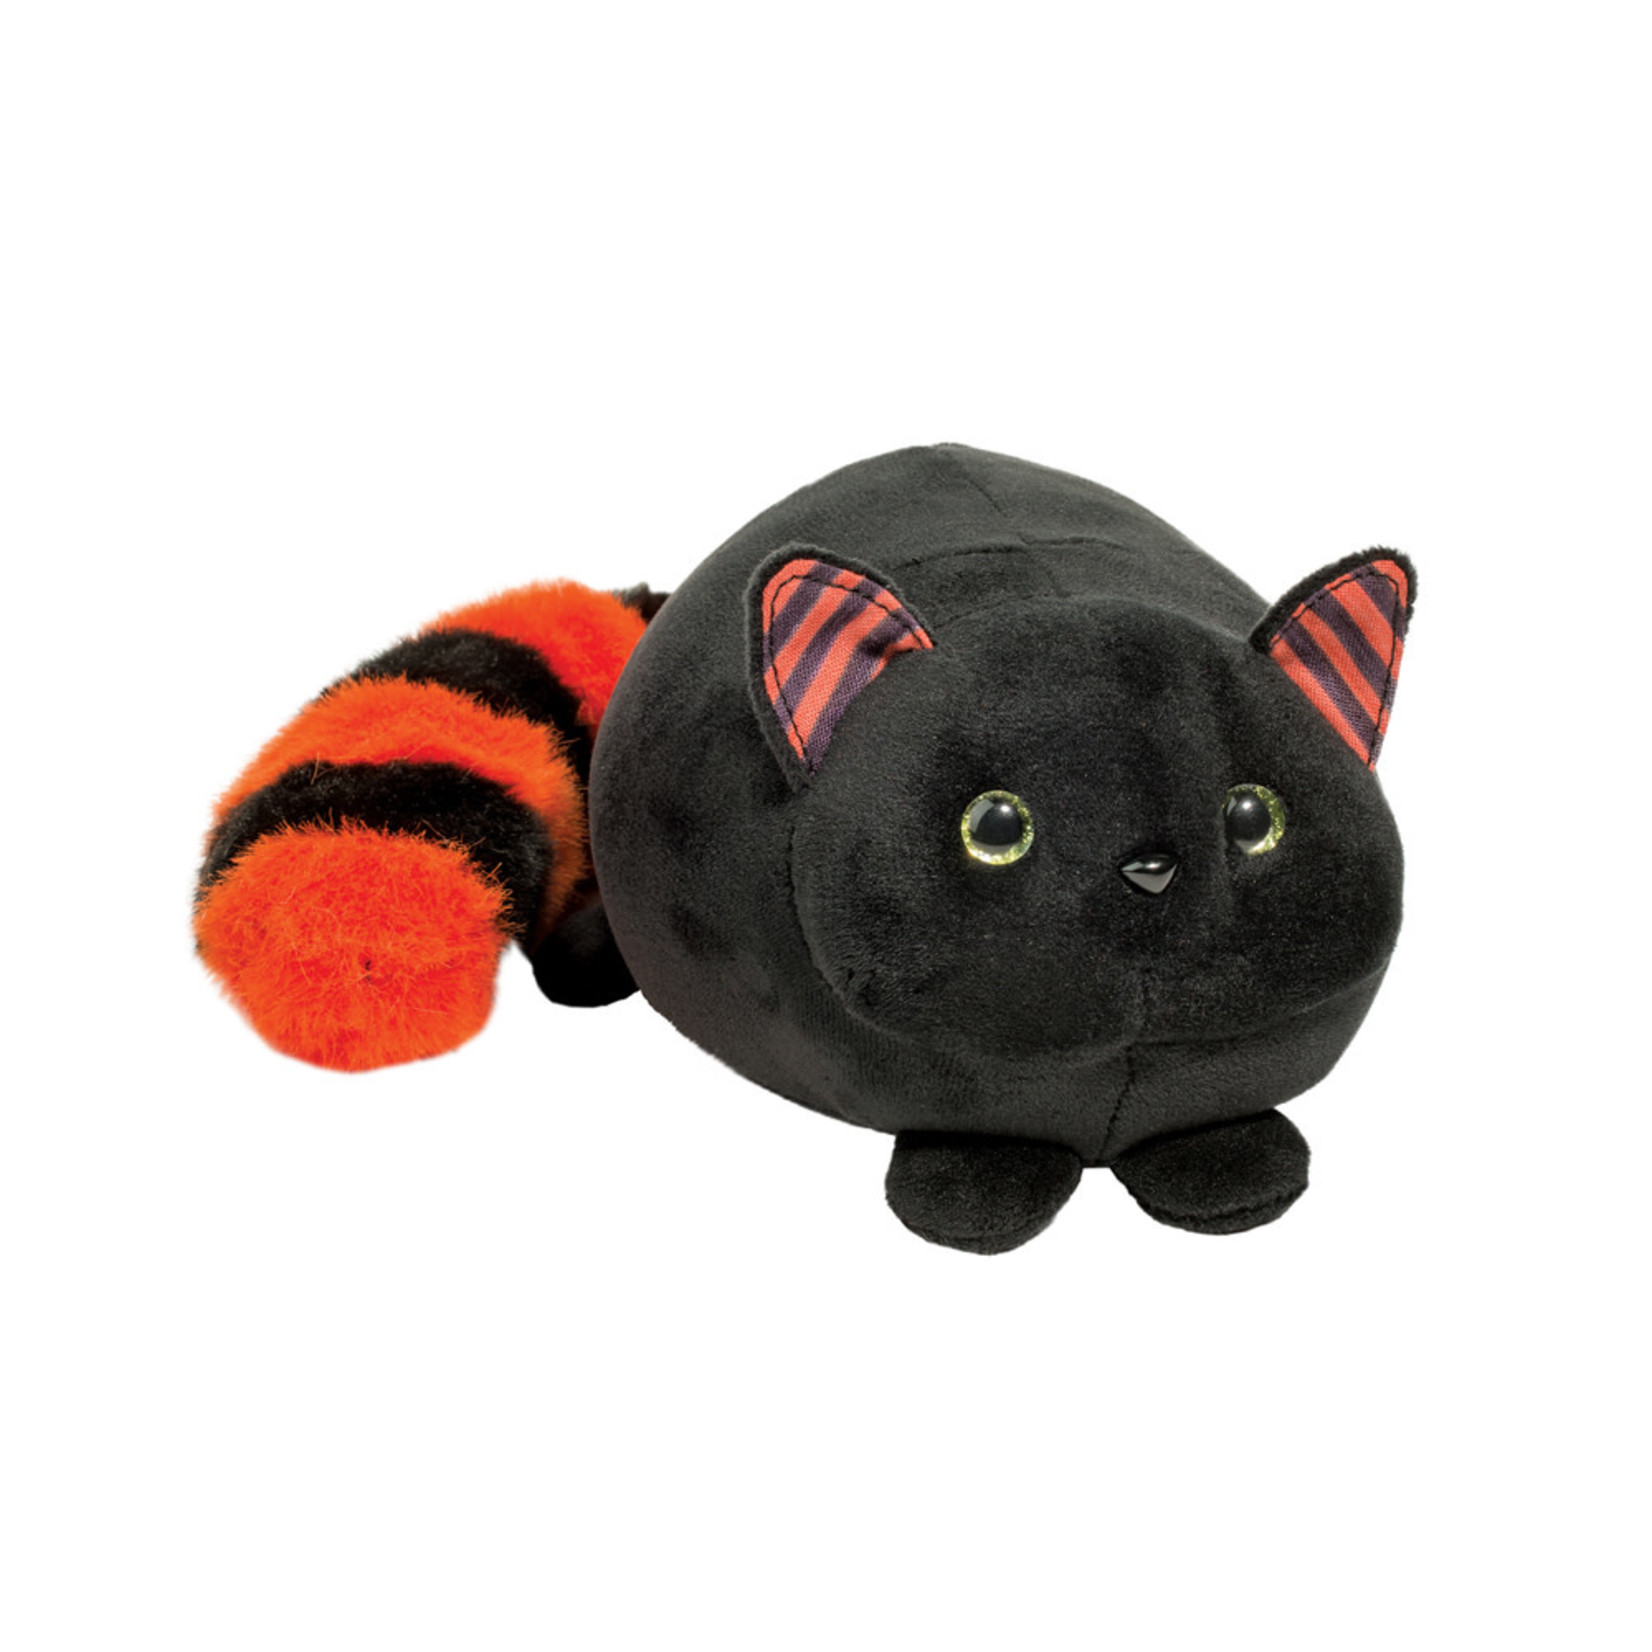 Douglas Hex Black Cat Macaroon